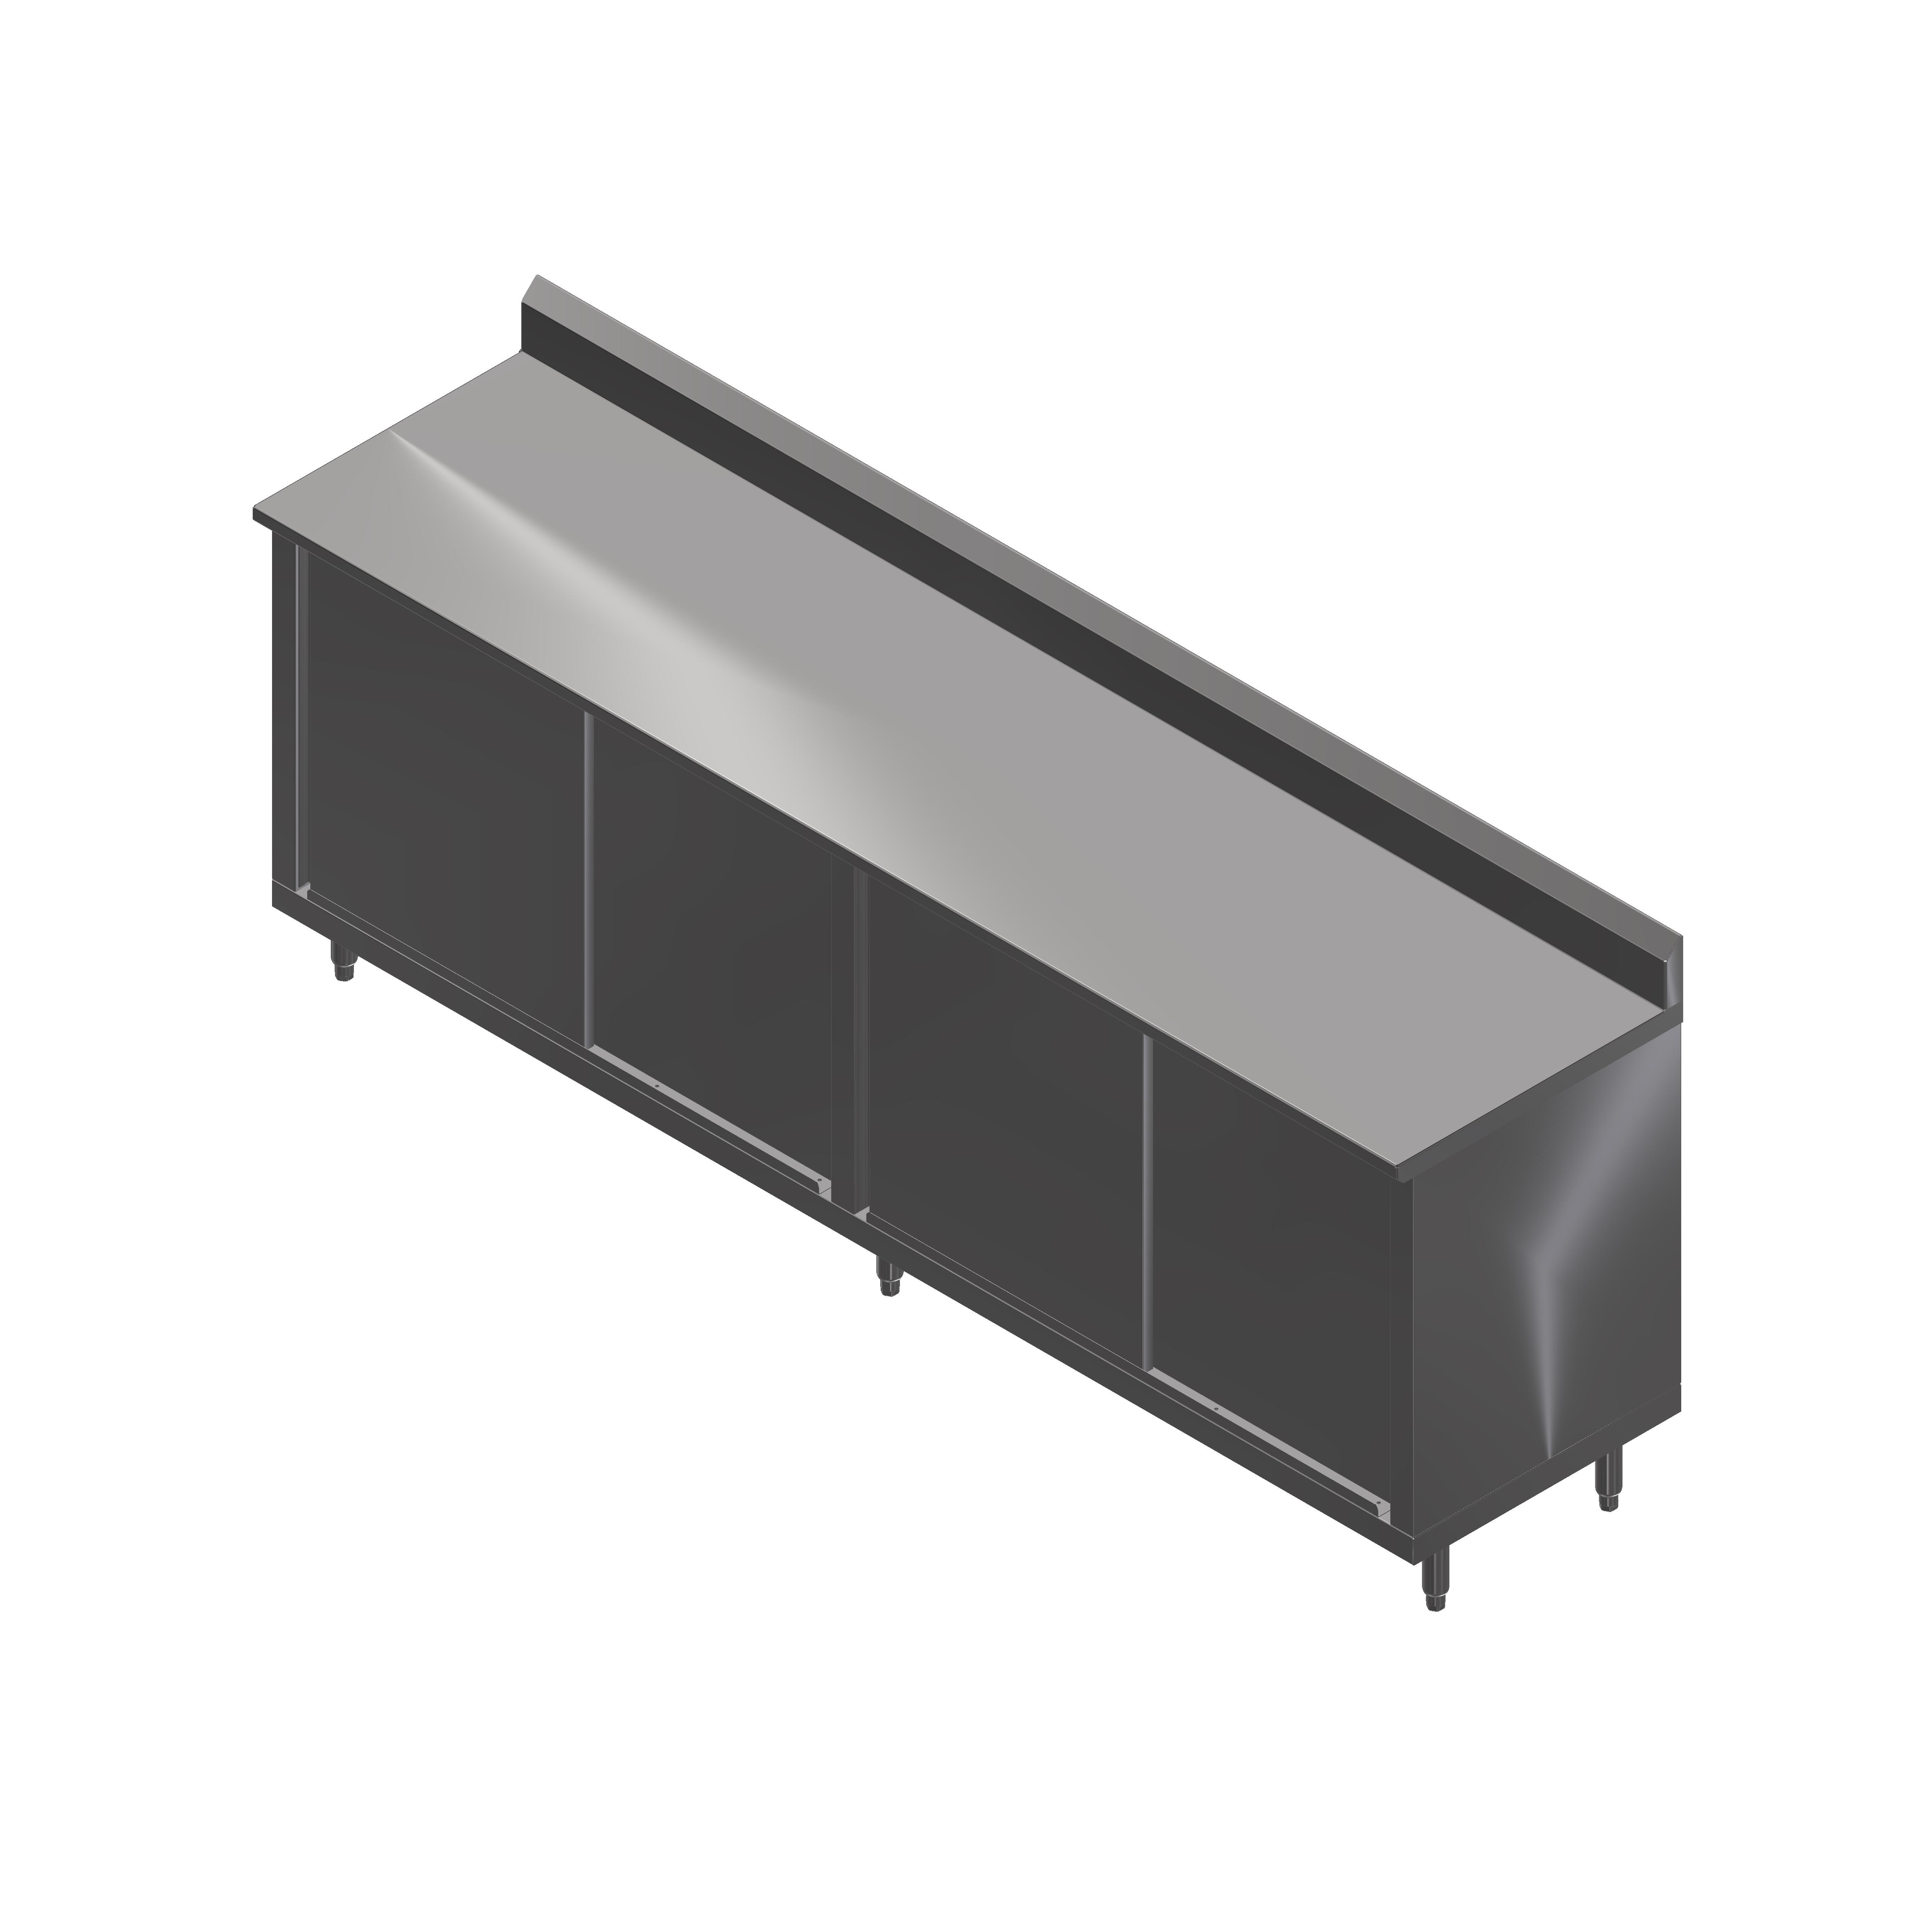 John Boos 4CS4R5-24144 work table, cabinet base sliding doors